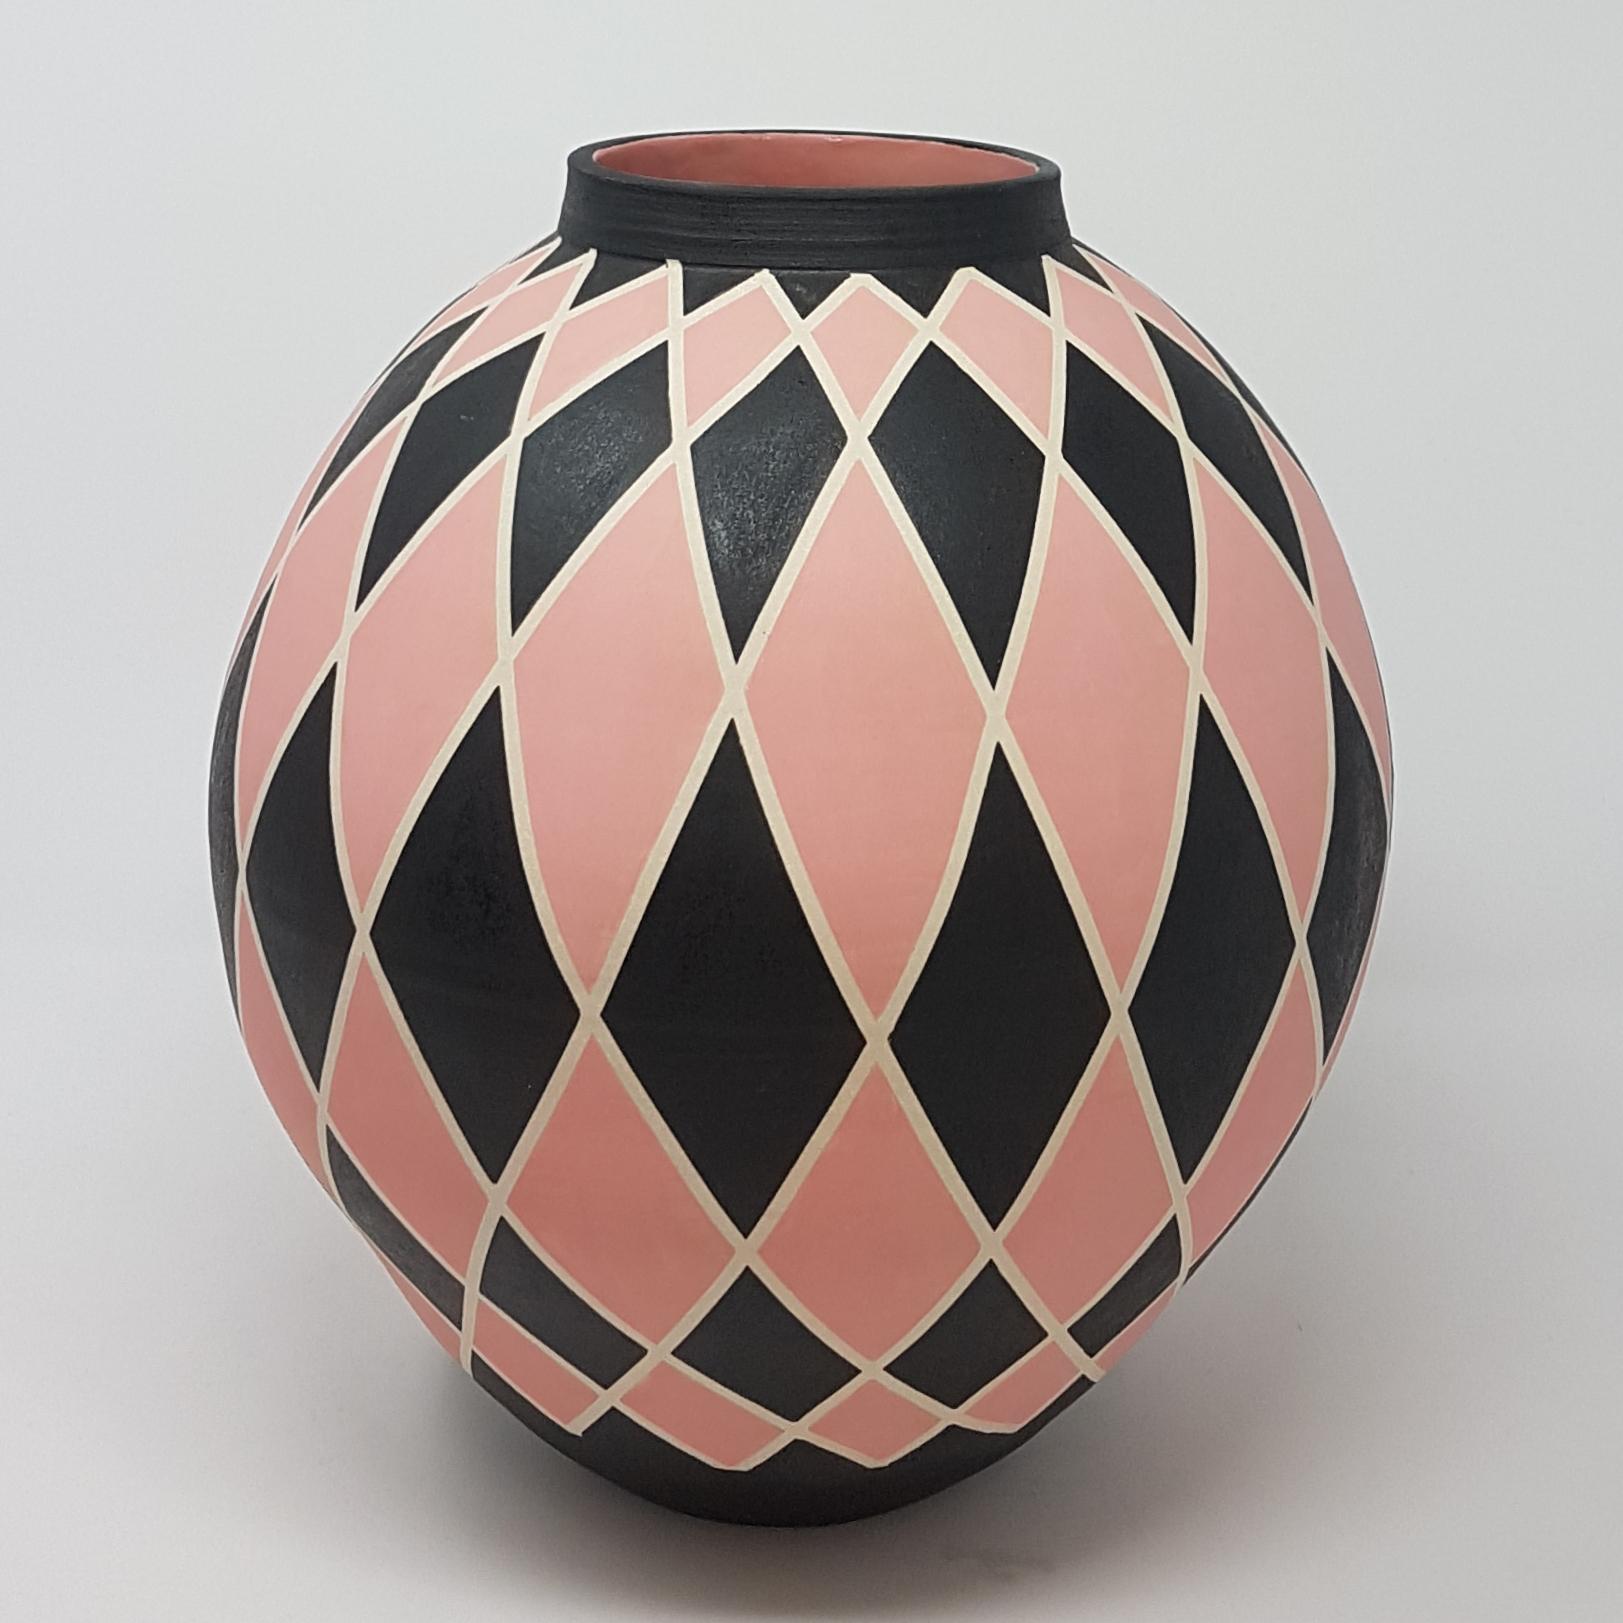 PINK HARLEQUIN MOON JAR BY JANE BRIDGER